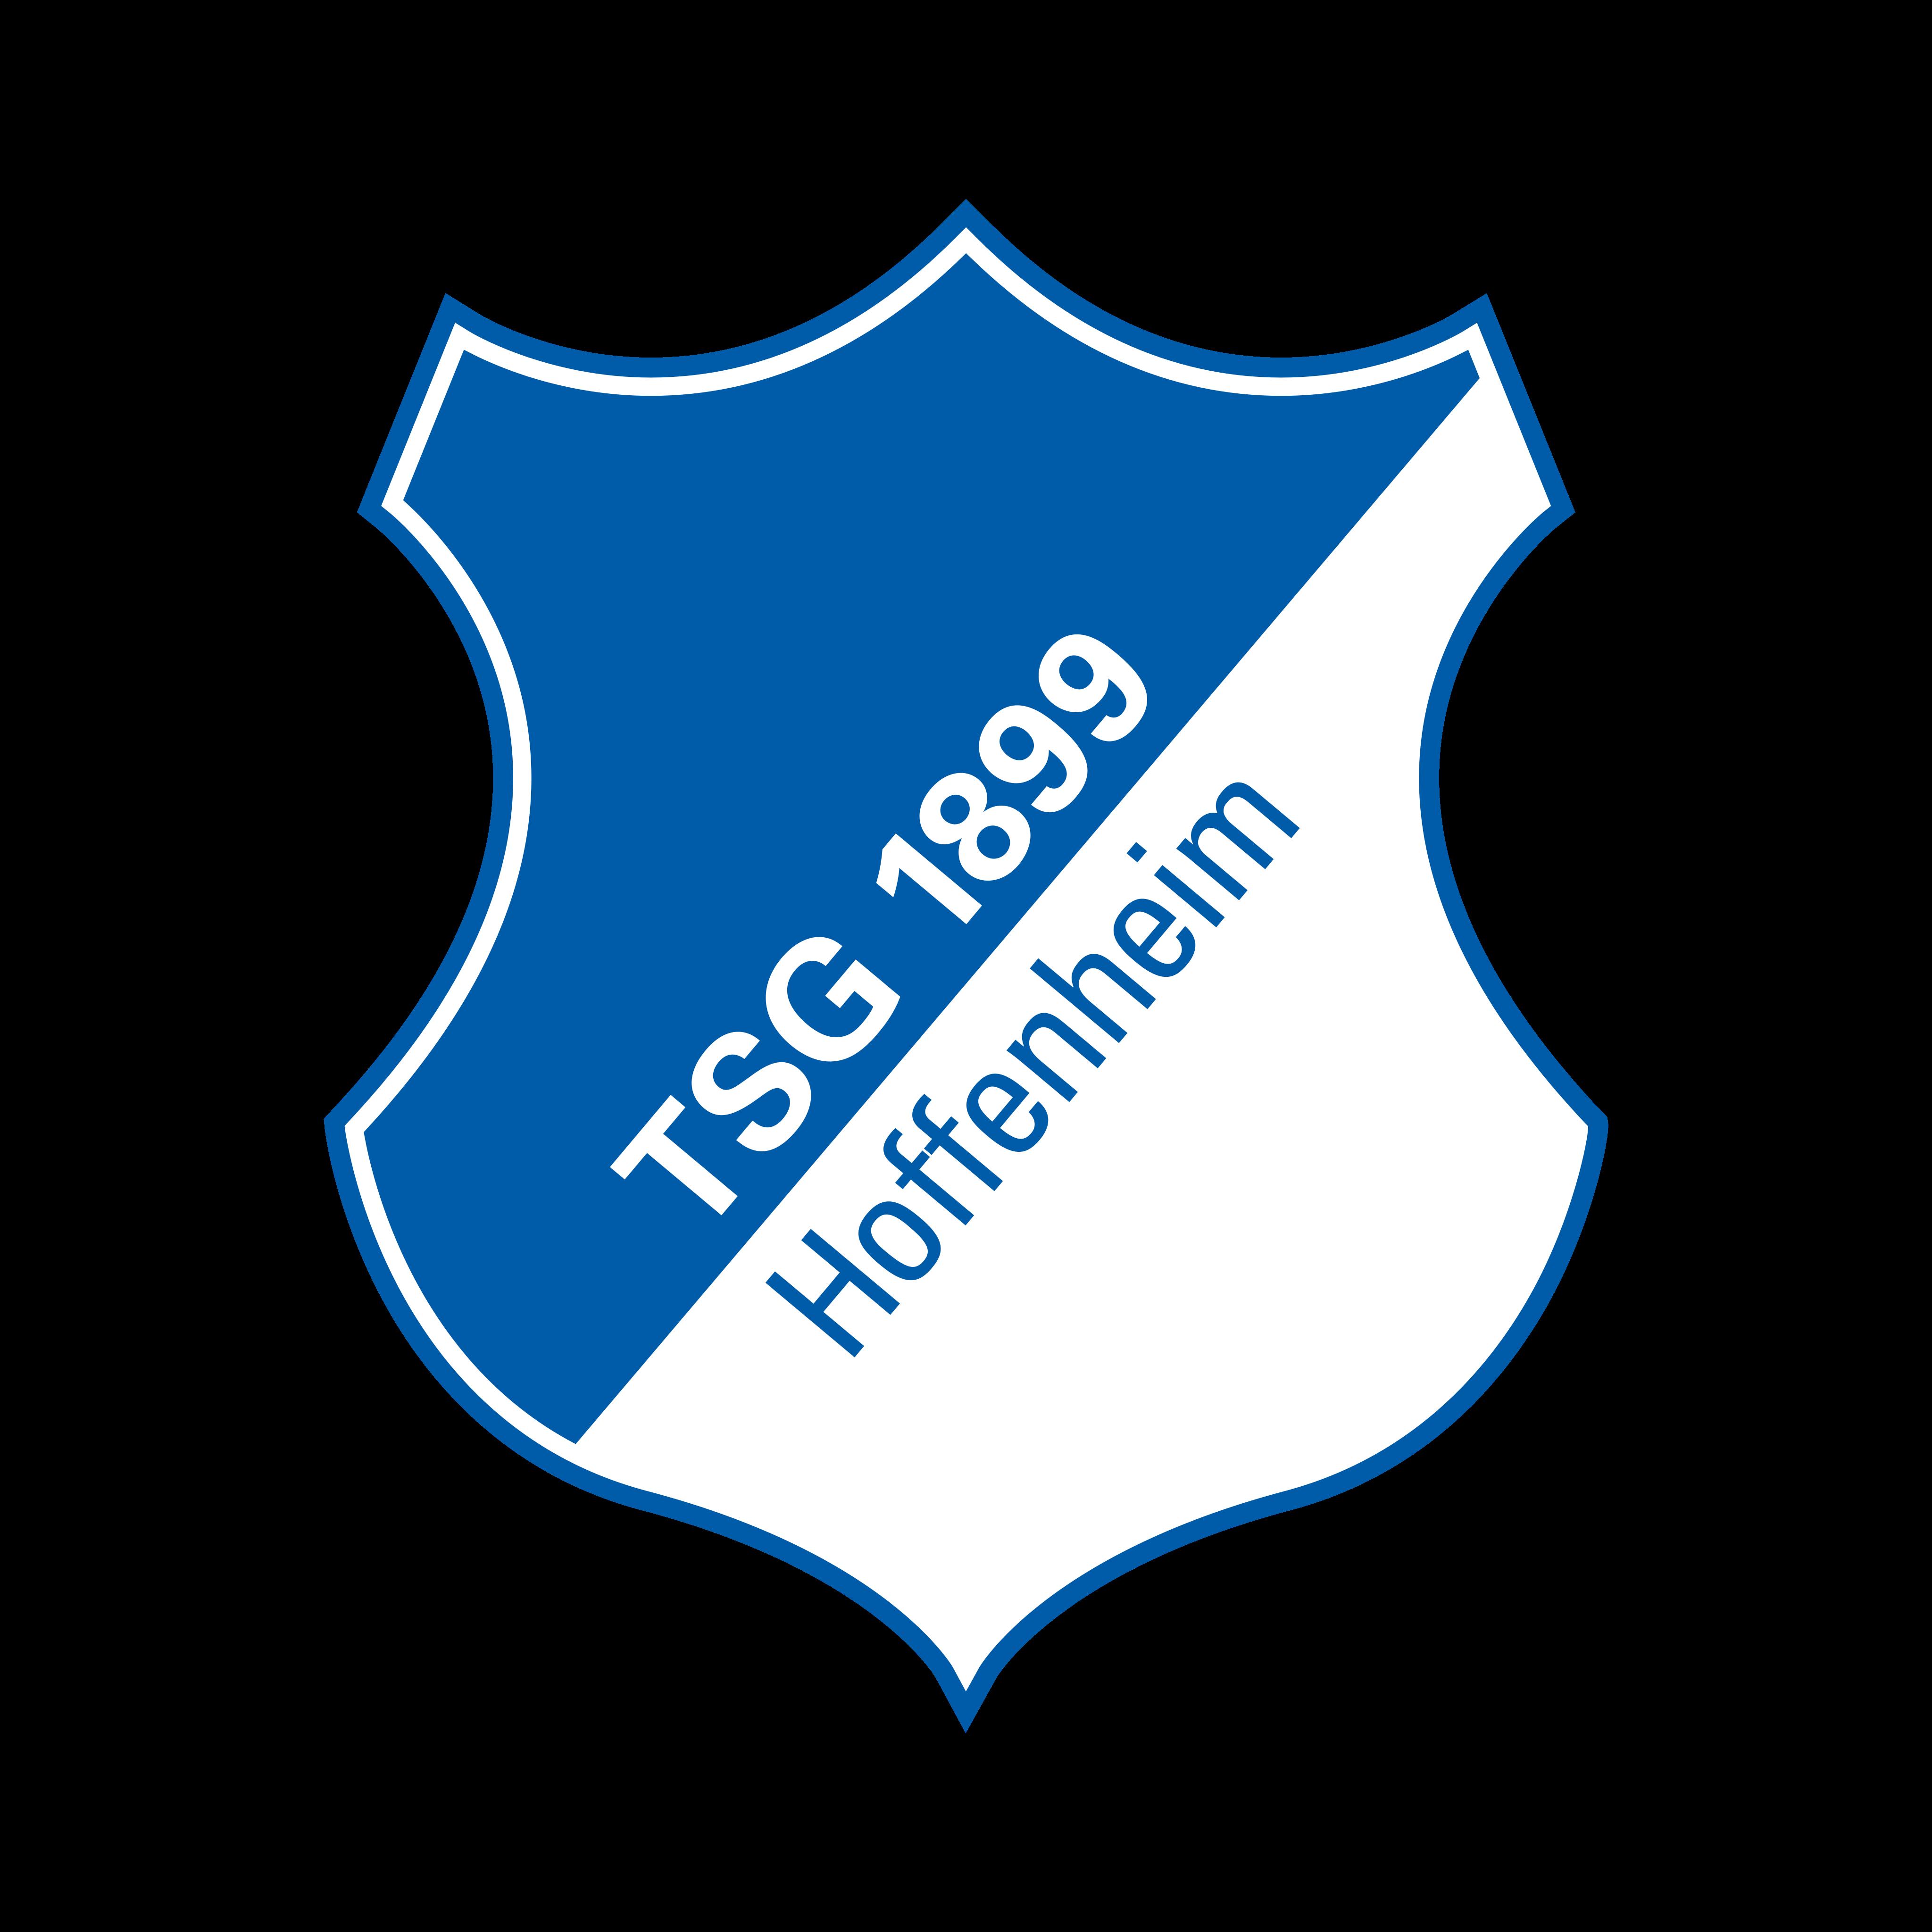 hoffenheim logo 0 - Hoffenheim Logo